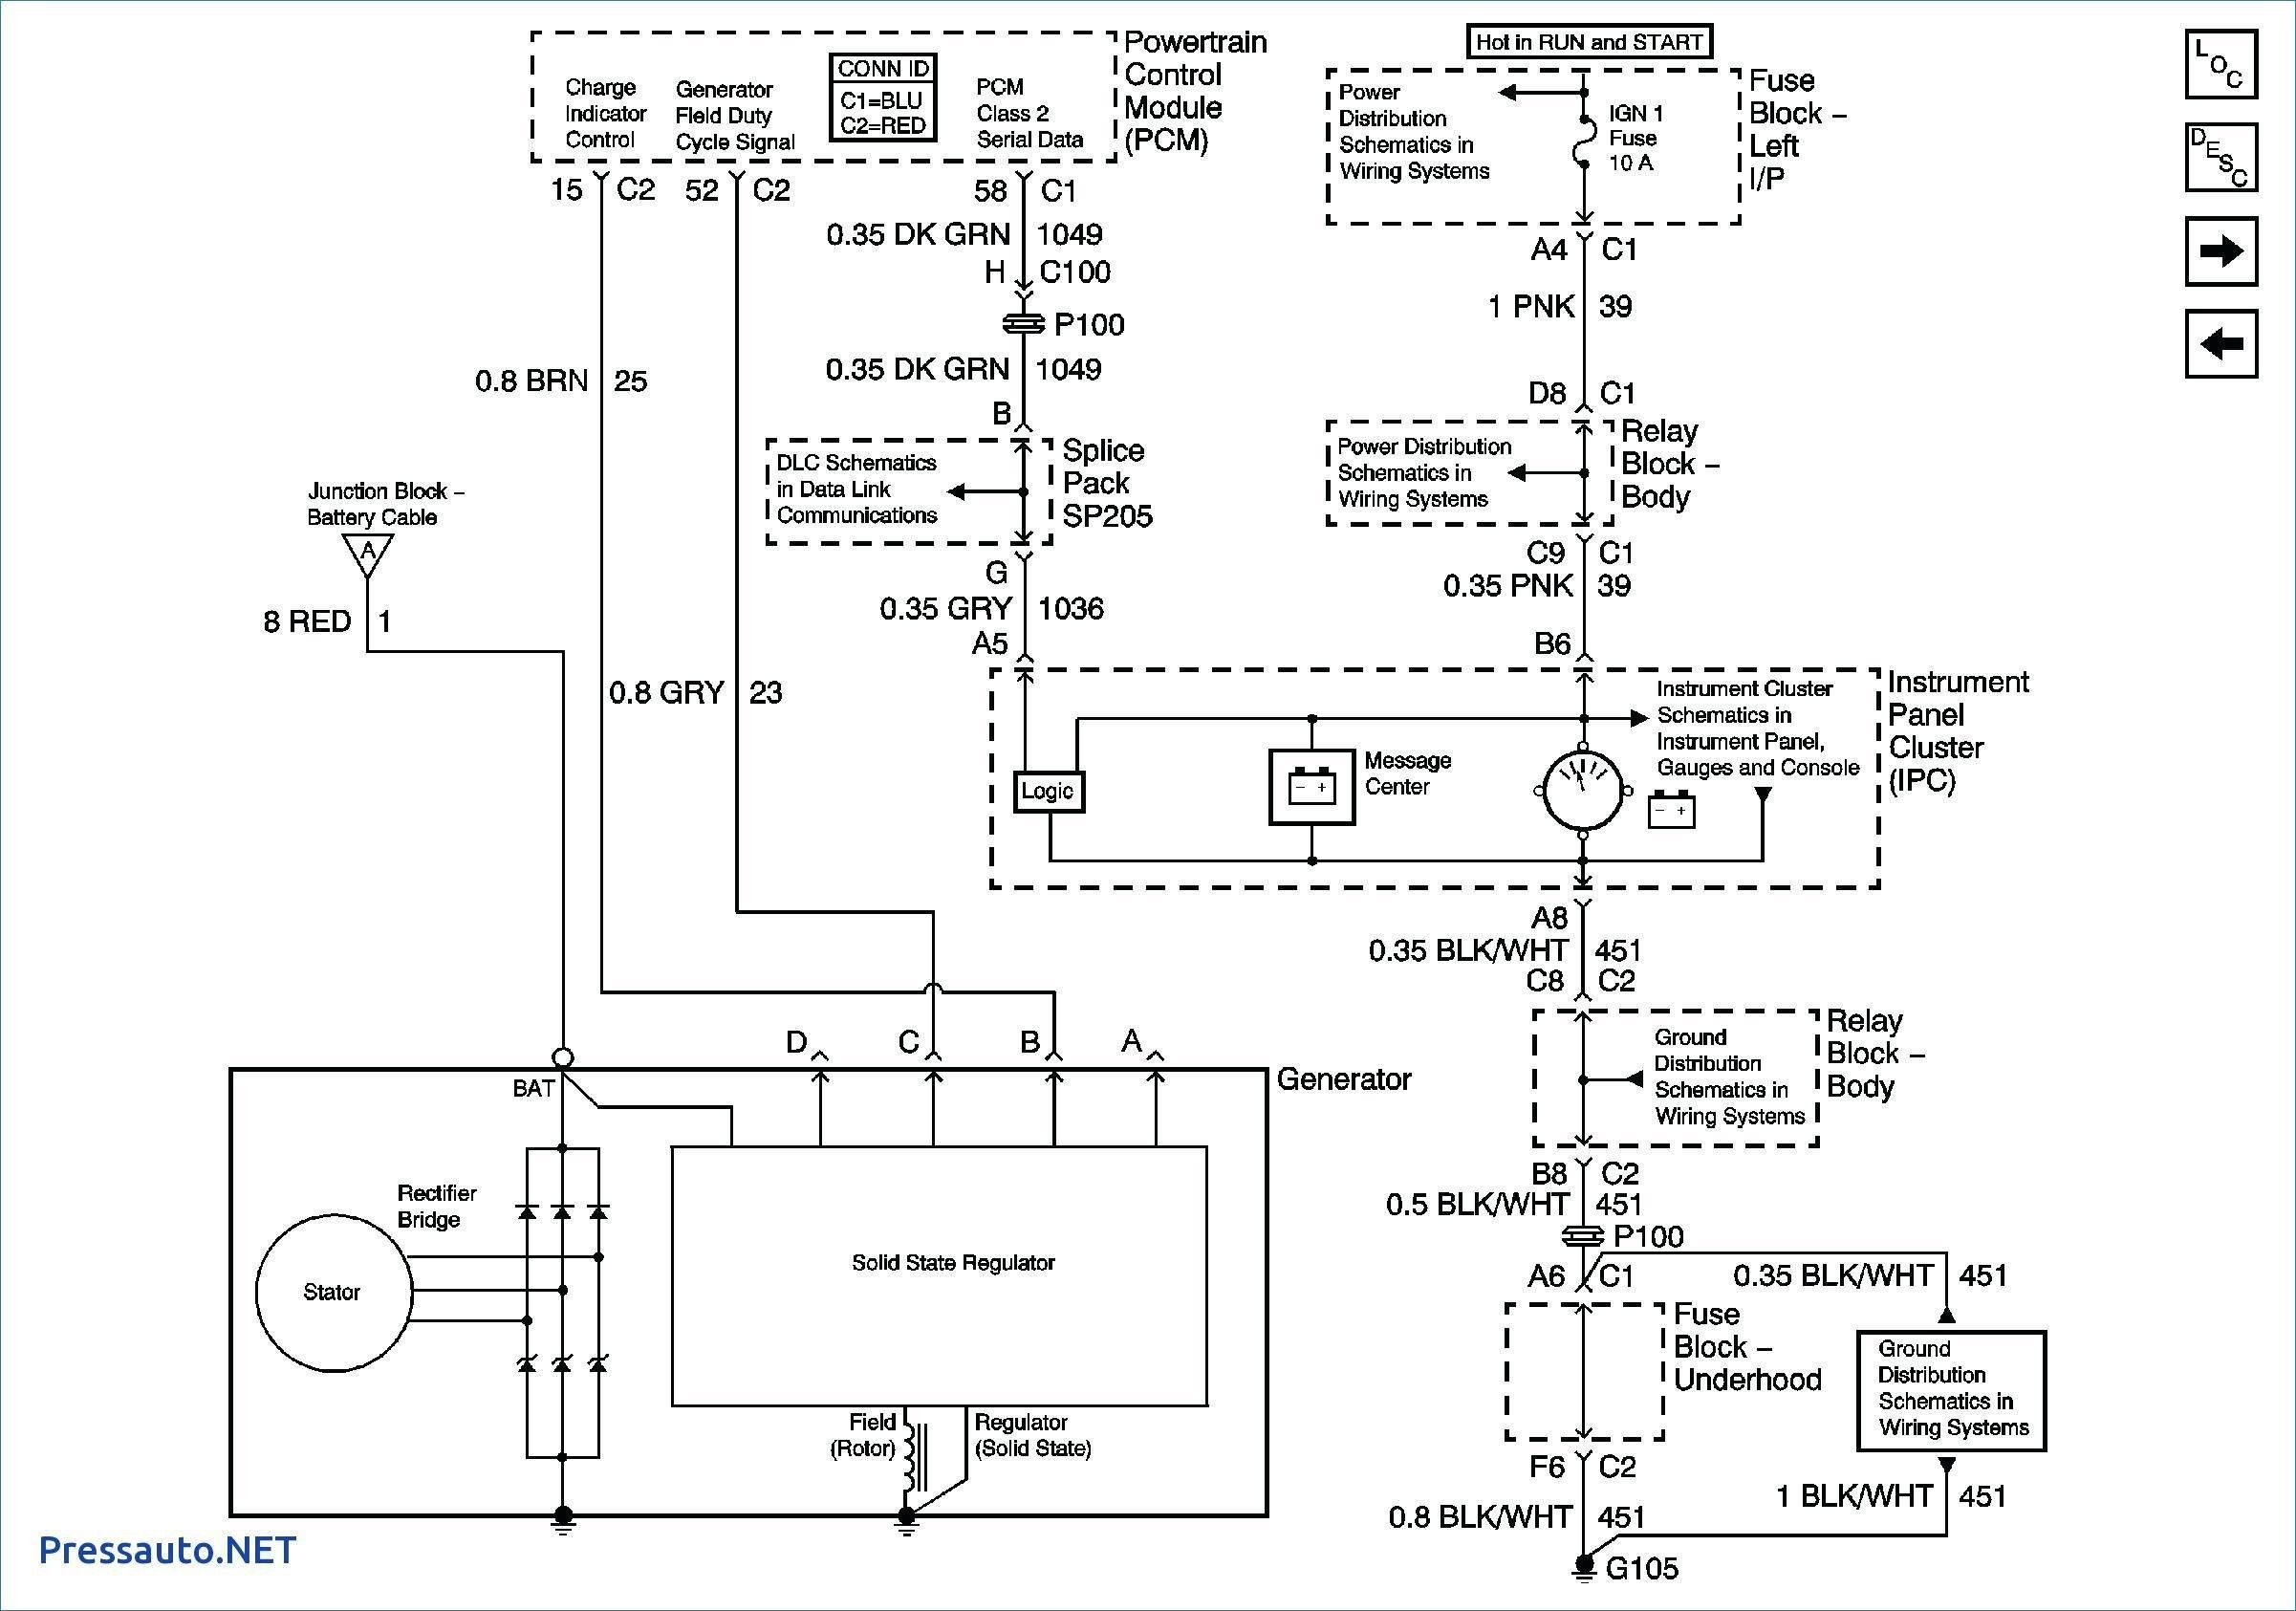 Unique Wiring Schematic Legend Diagram Wiringdiagram Diagramming Diagramm Visuals Visualisation Graphical Electrical Wiring Diagram Alternator Diagram